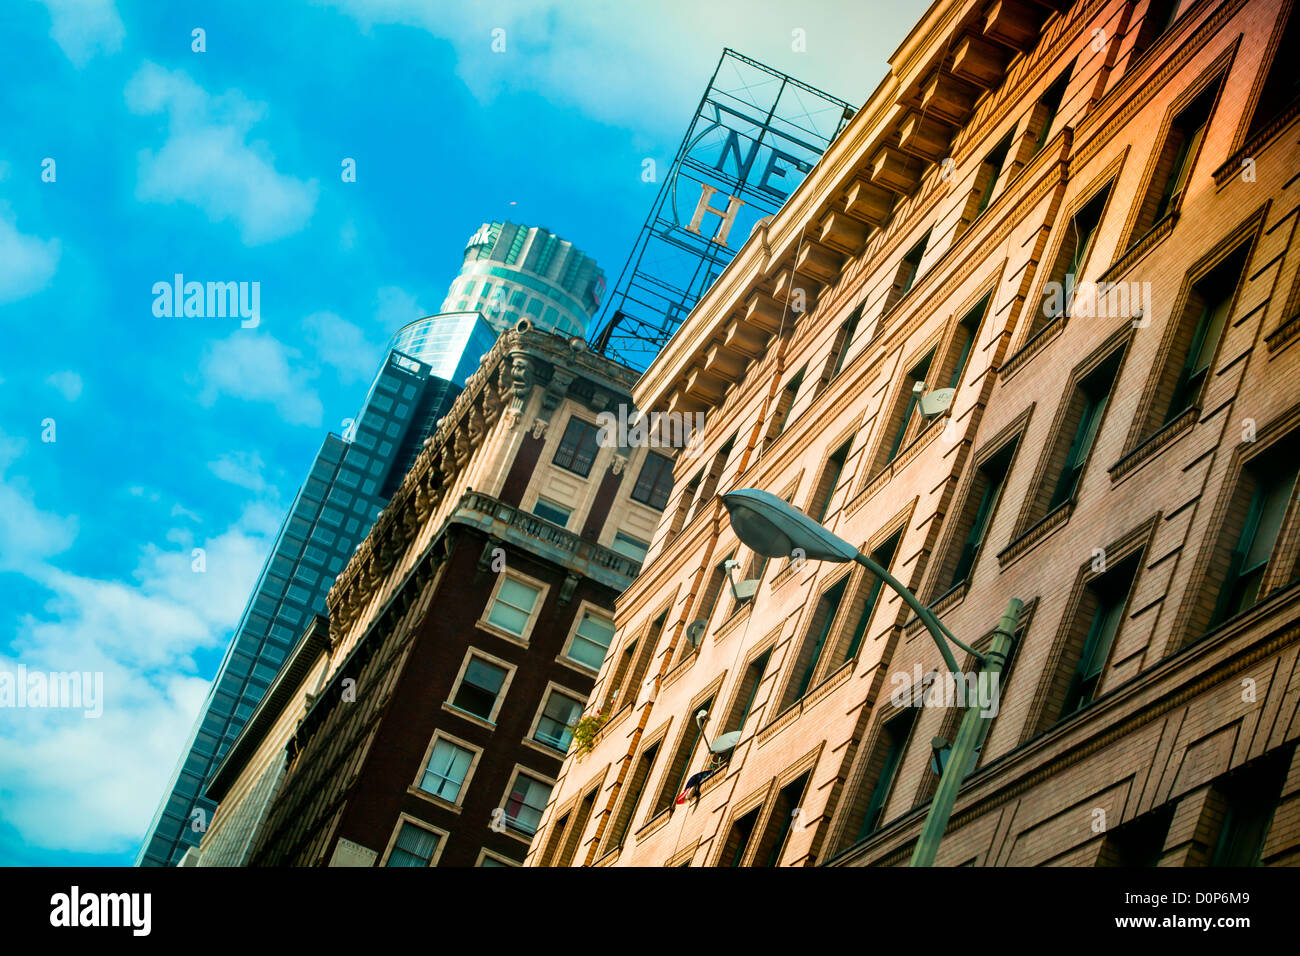 Old and sky scraper buildings in Downtown Los Angeles below a blue sky street lamp - Stock Image